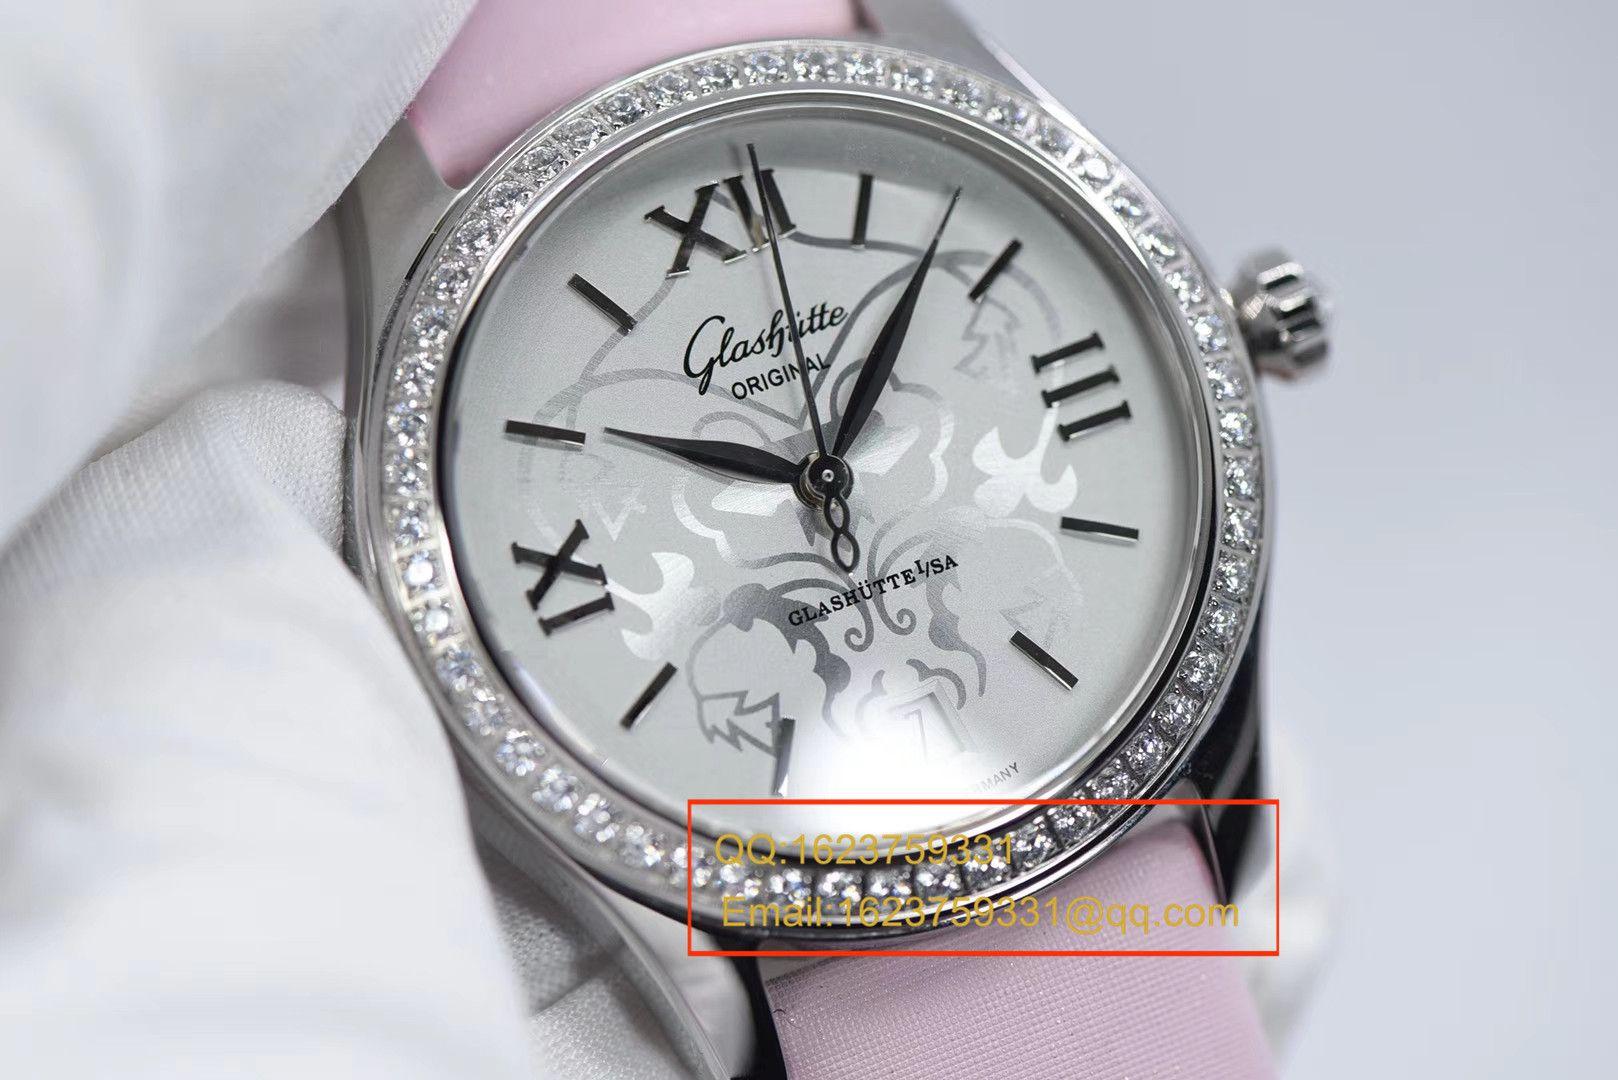 【FK一比一超A精仿女表】格拉苏蒂原创女表系列1-39-22-03-22-44腕表 / GLA048